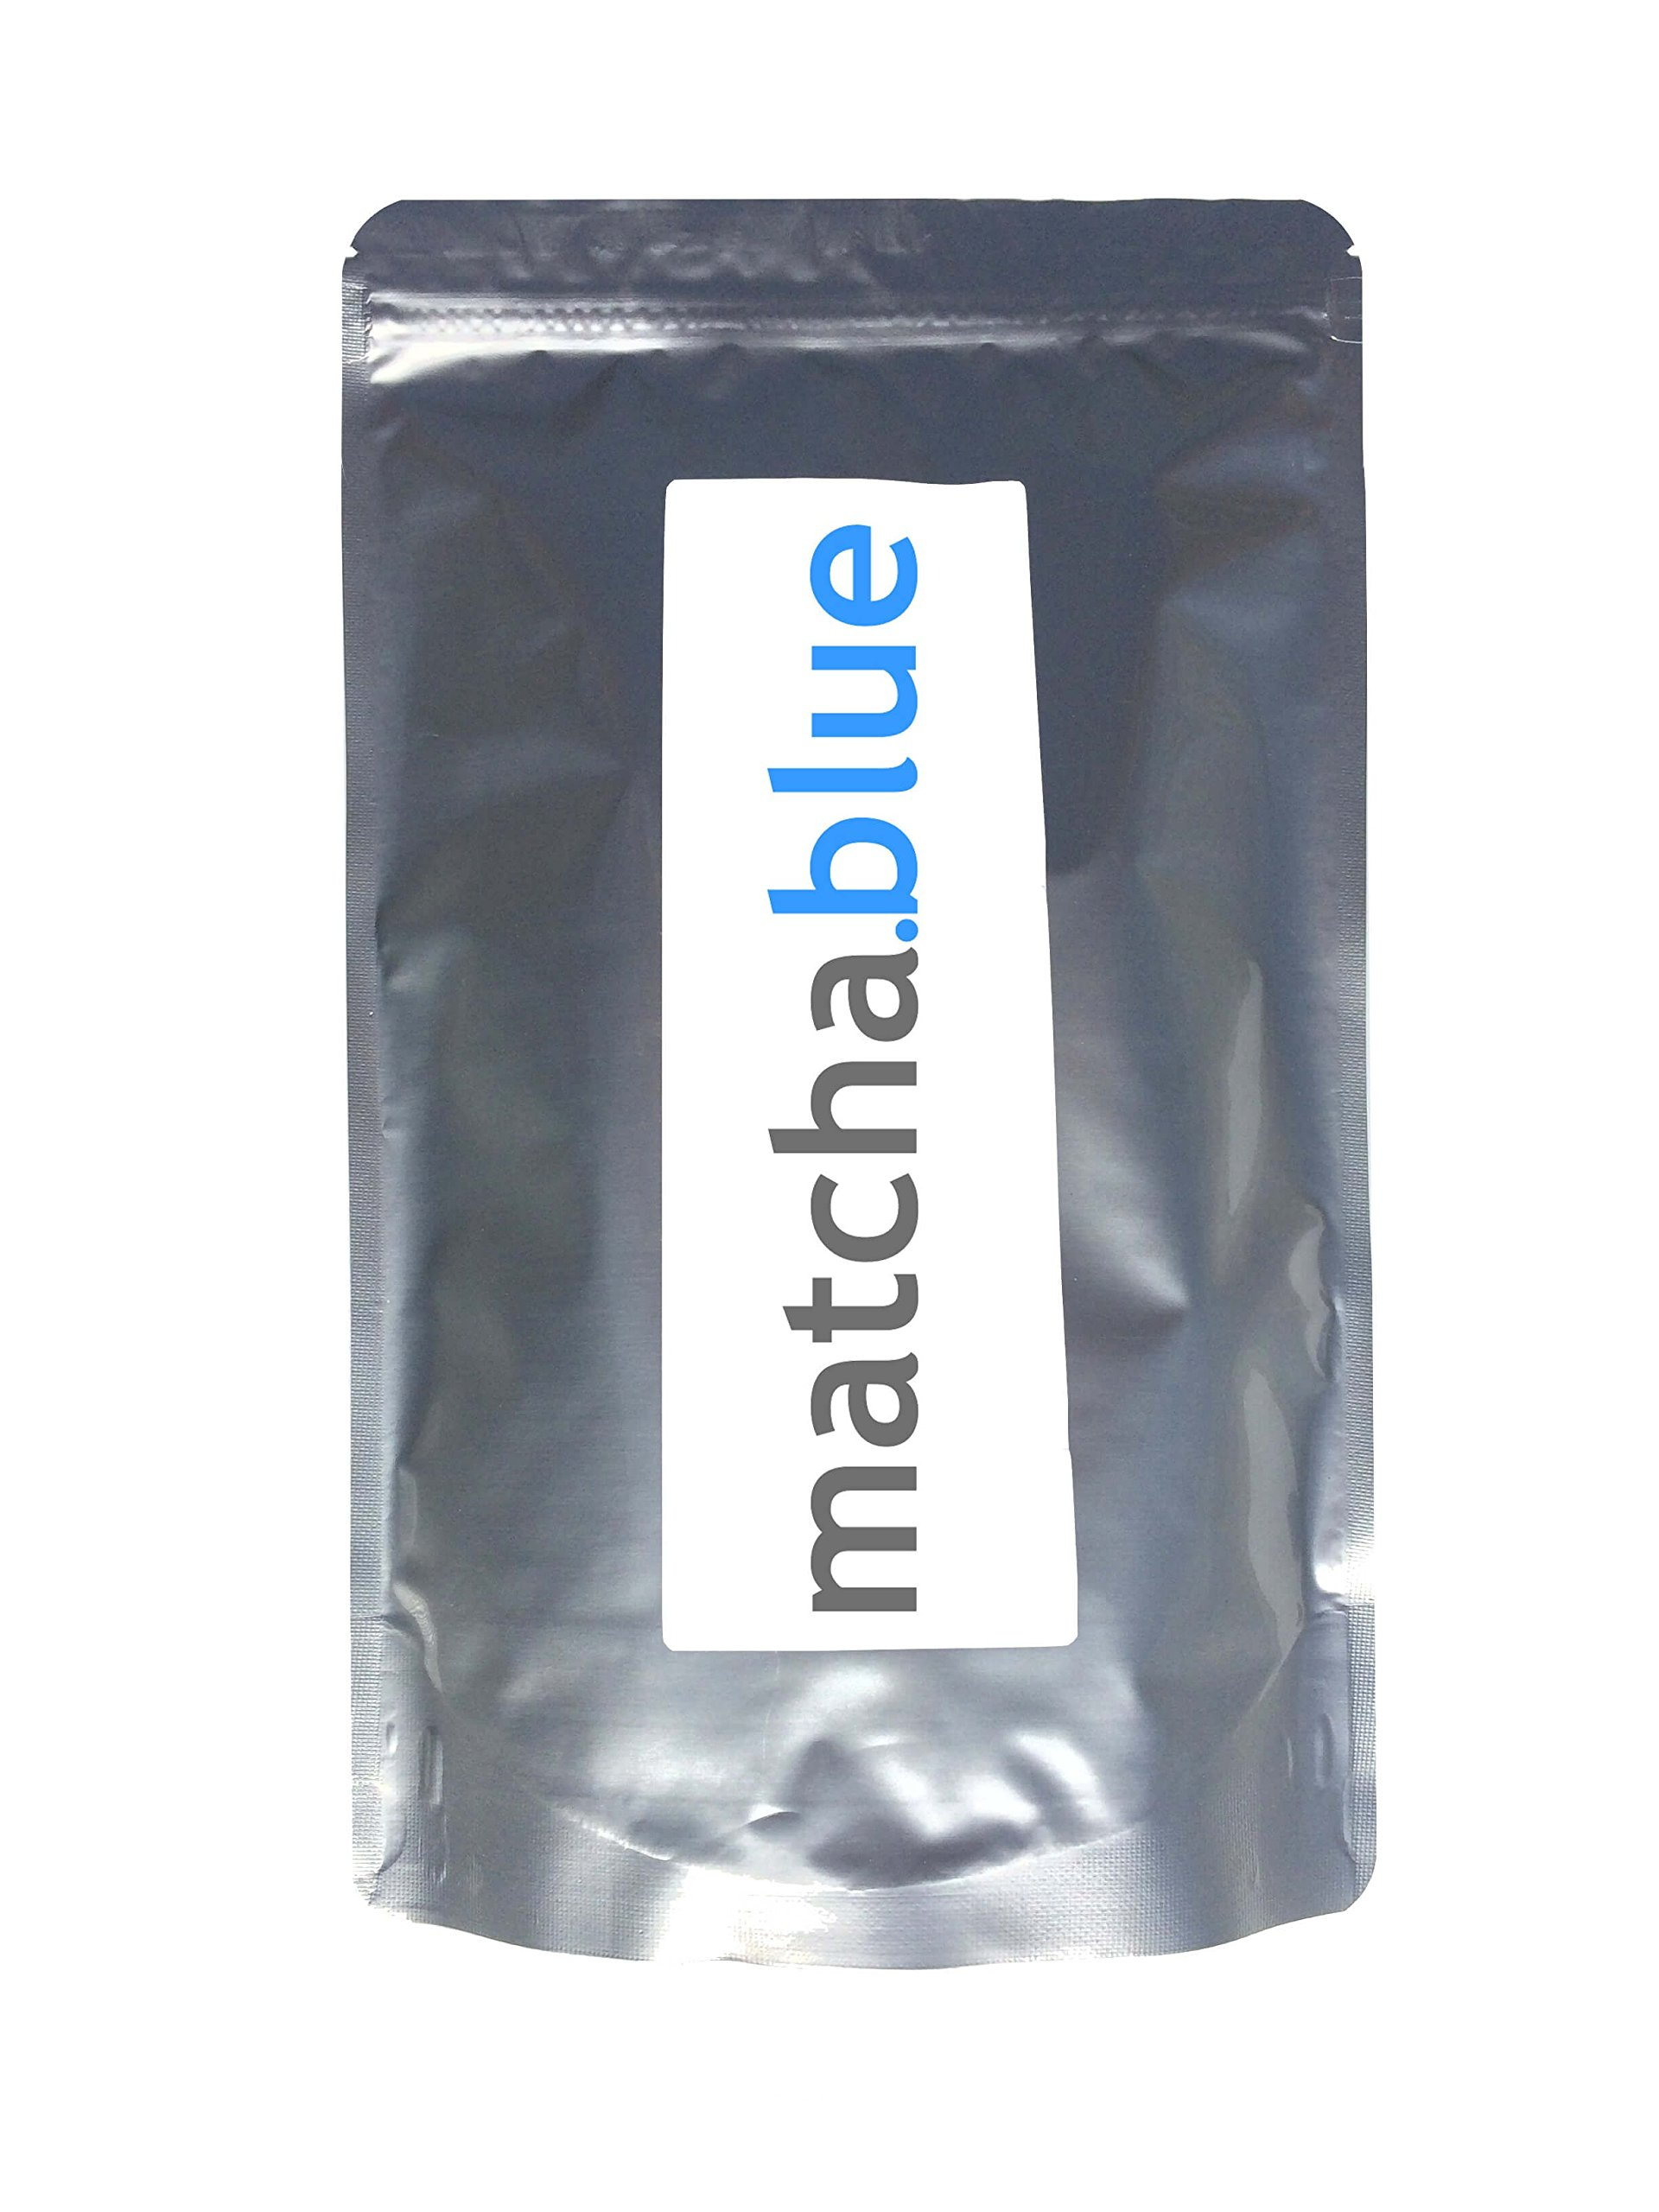 Blue Matcha – Organic Blue Matcha in Foodservice Doypack - 100% Natural Blue Food Dye